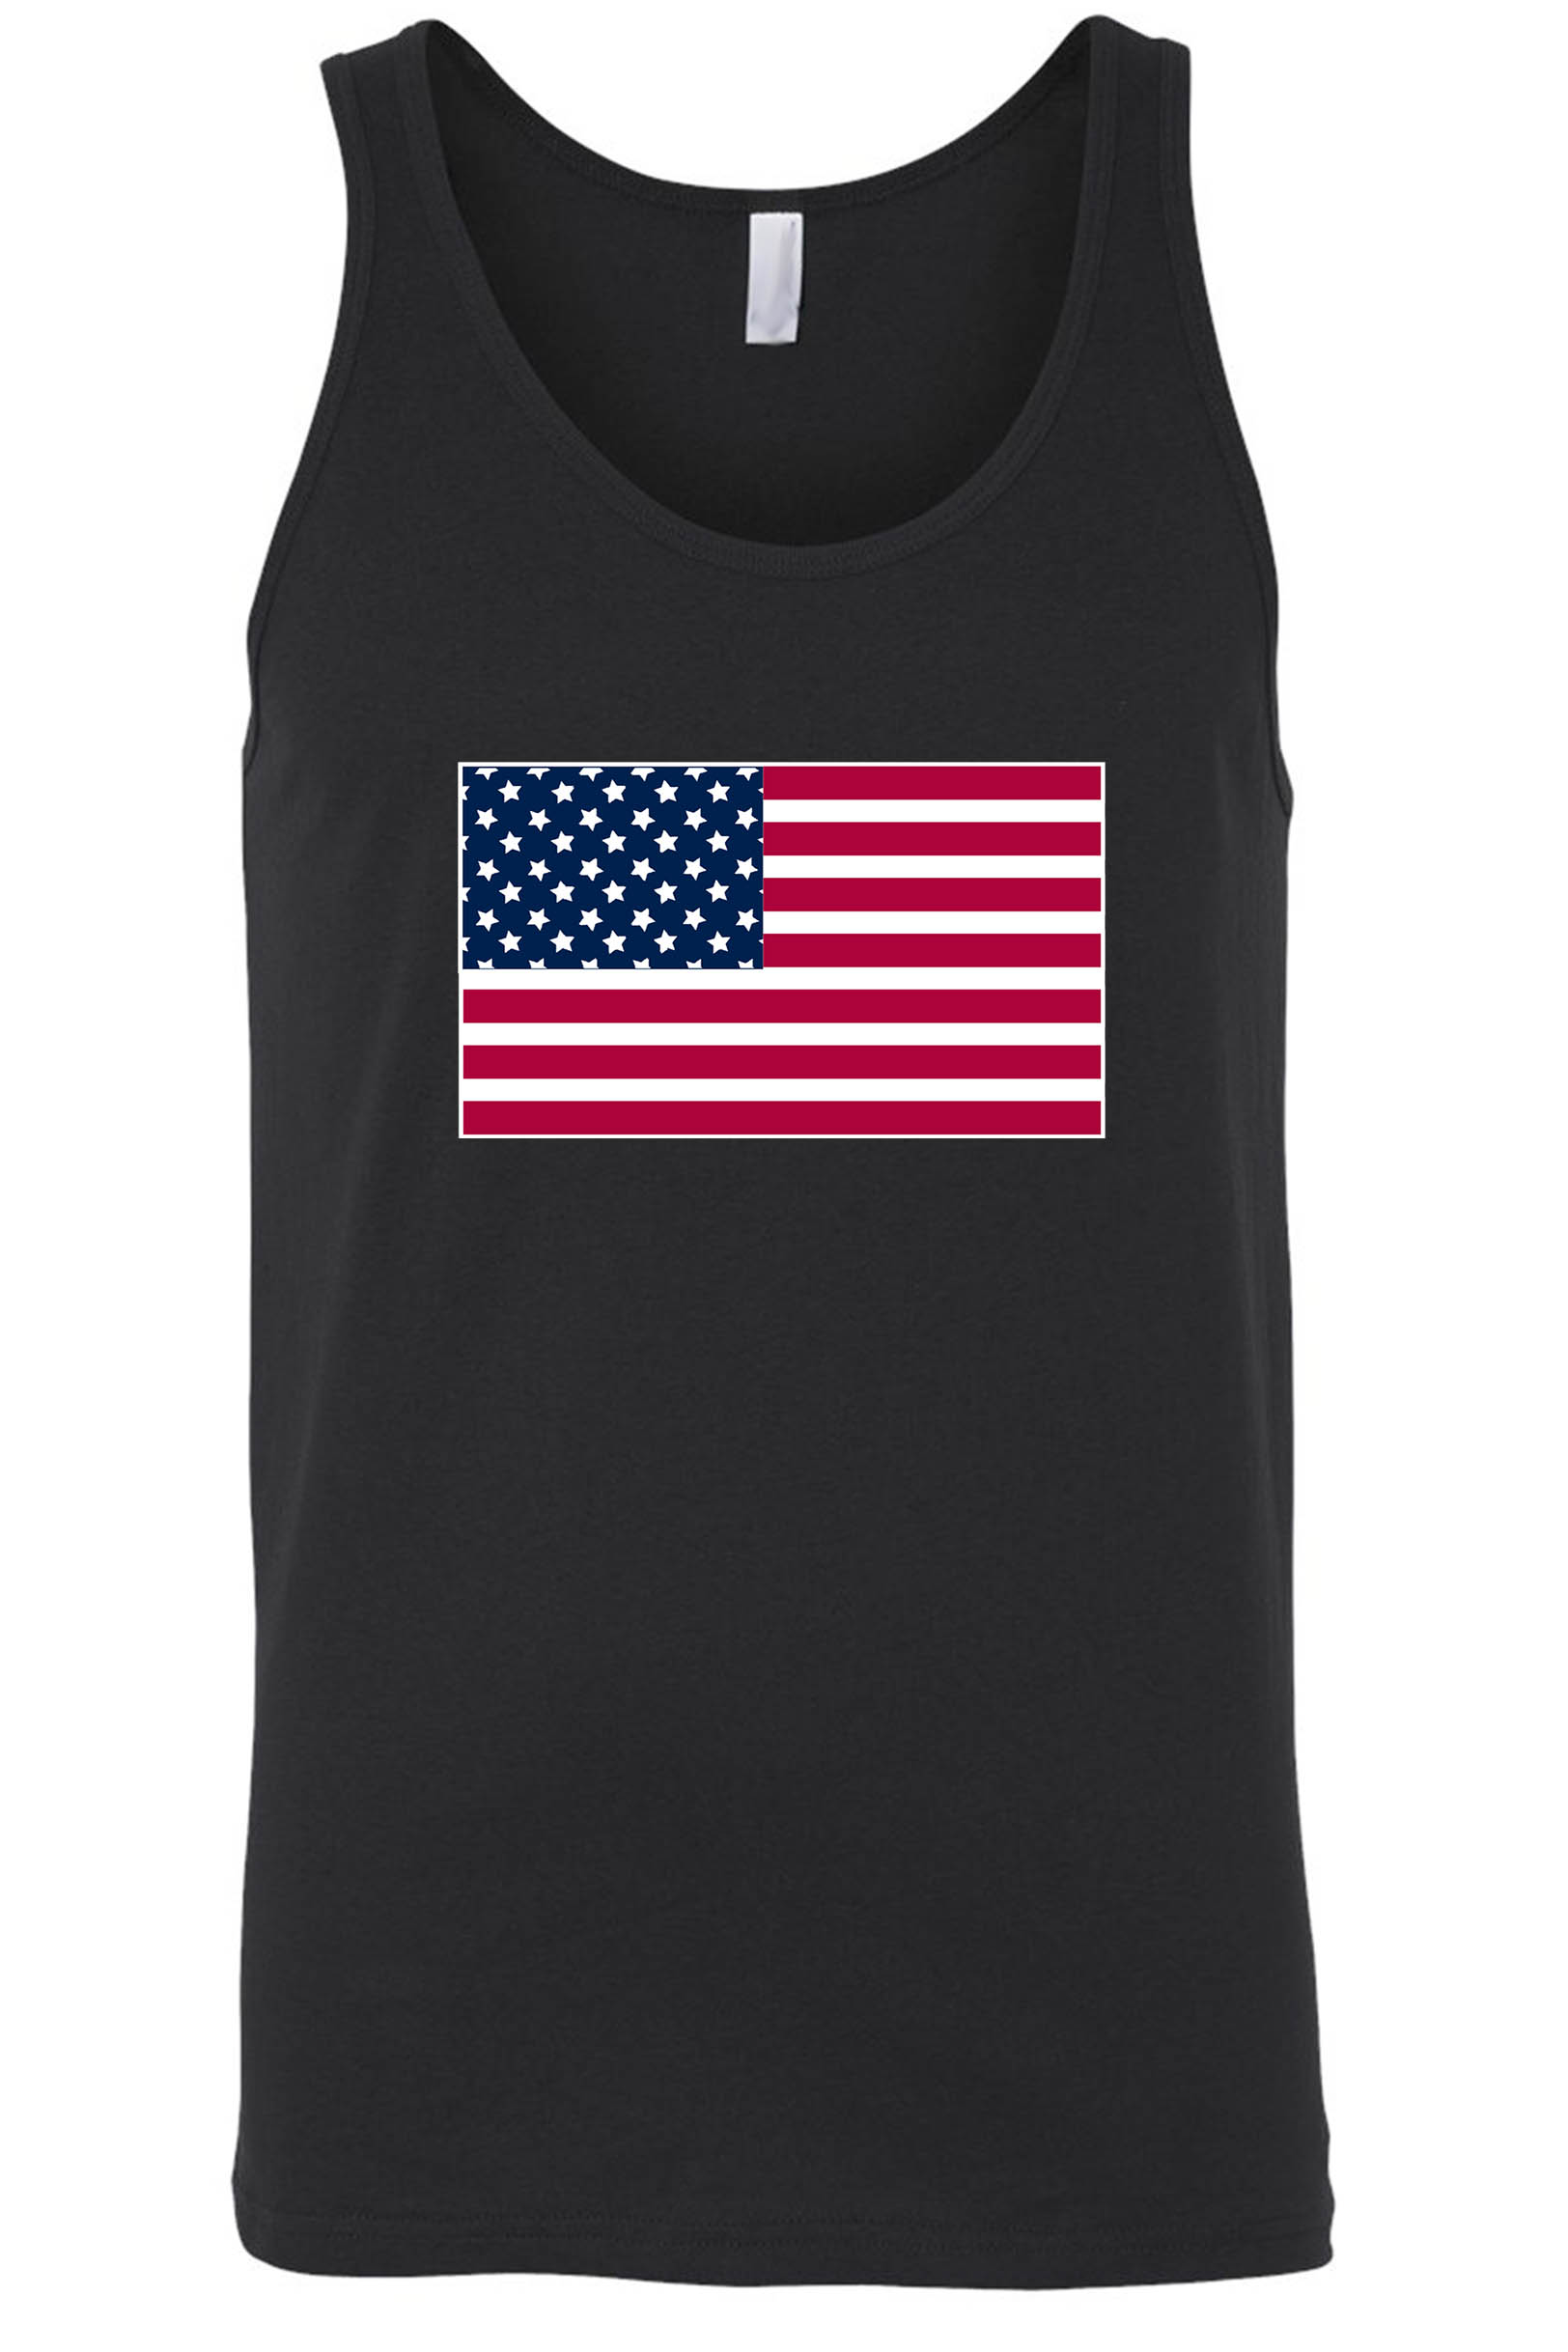 Men's USA Flag Pride Tank Top Shirt